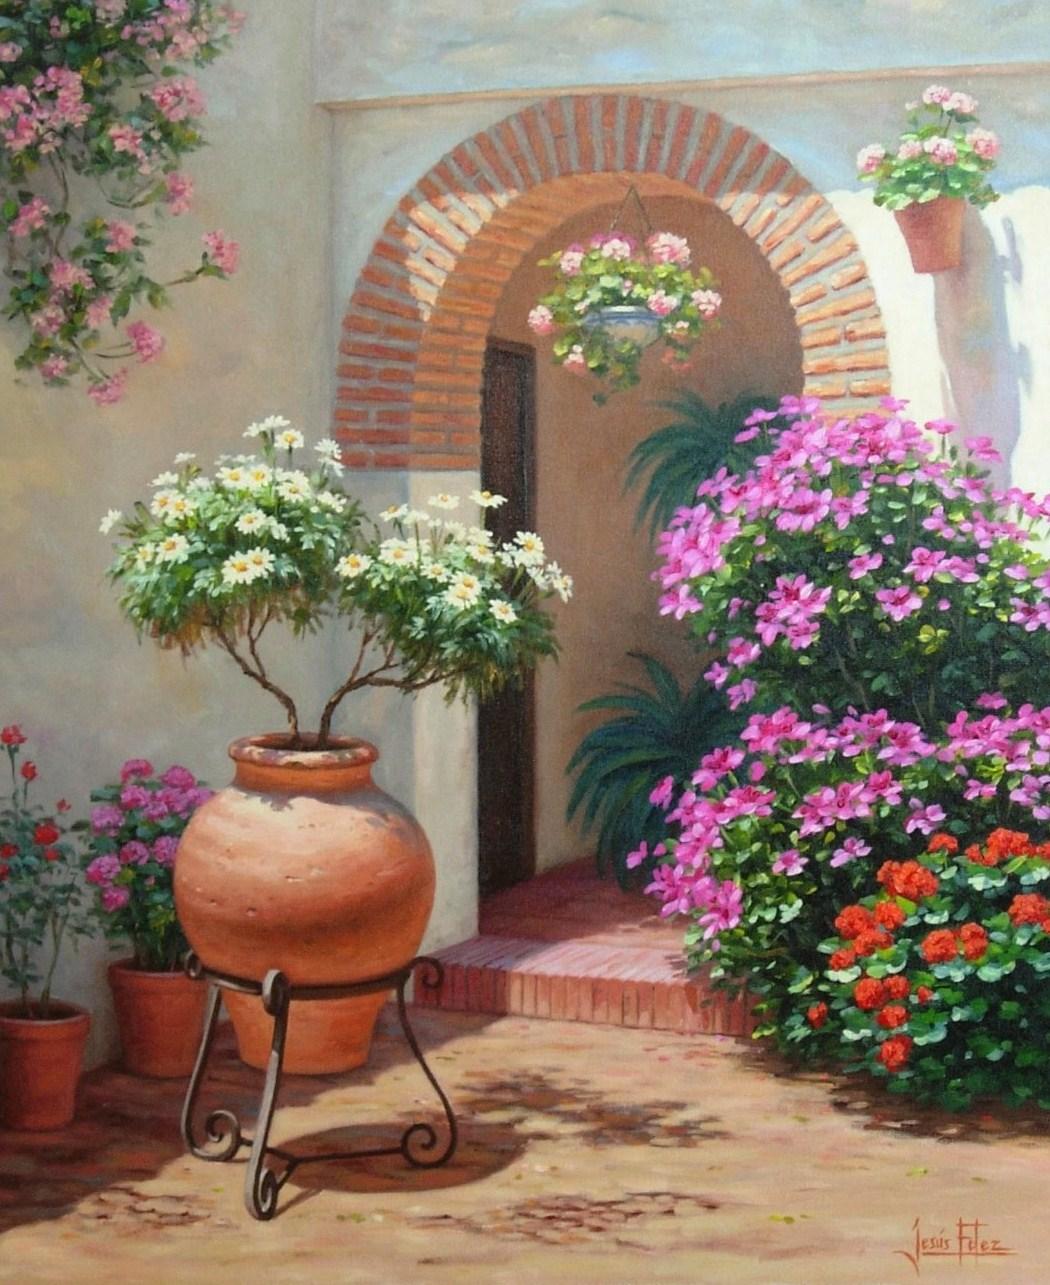 Pintura moderna y fotograf a art stica paisajes con - Pintura para terrazas ...